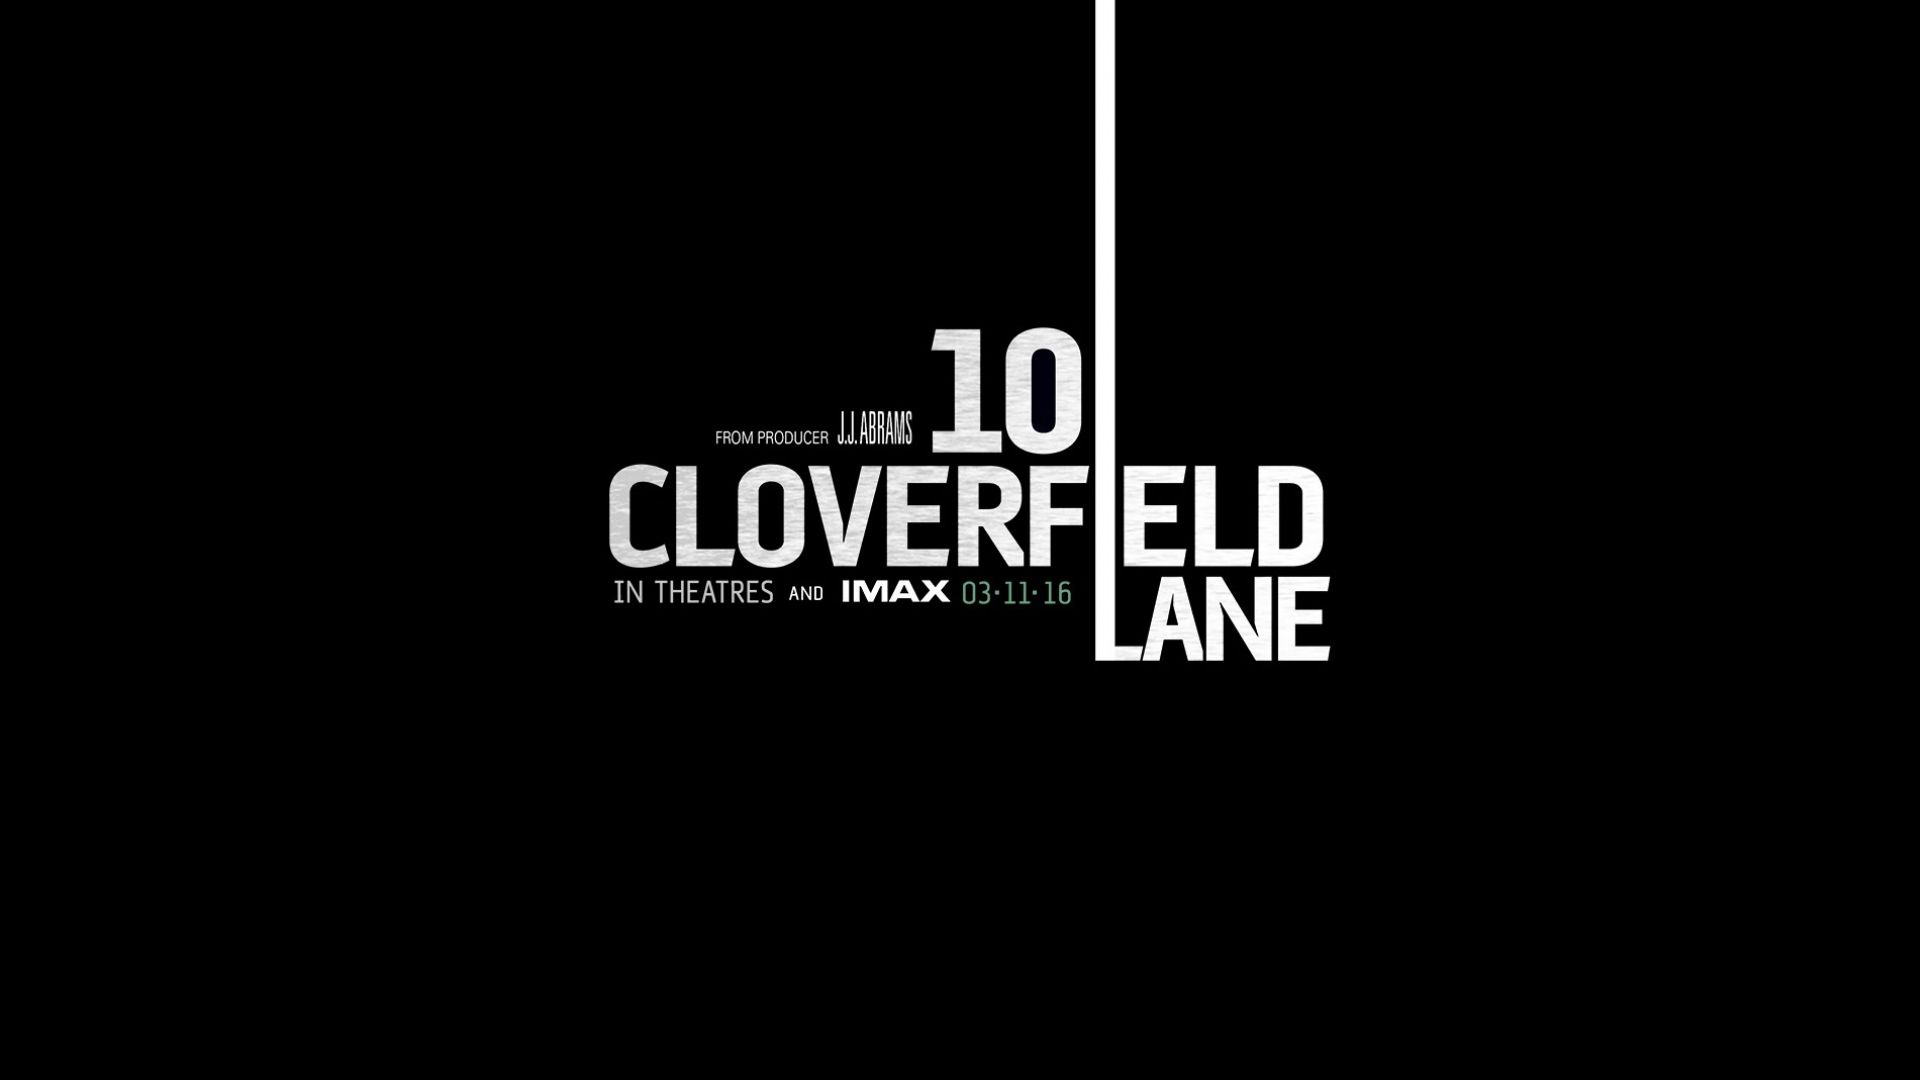 Secret Cloverfield sequel happening: '10 Cloverfield Lane' t